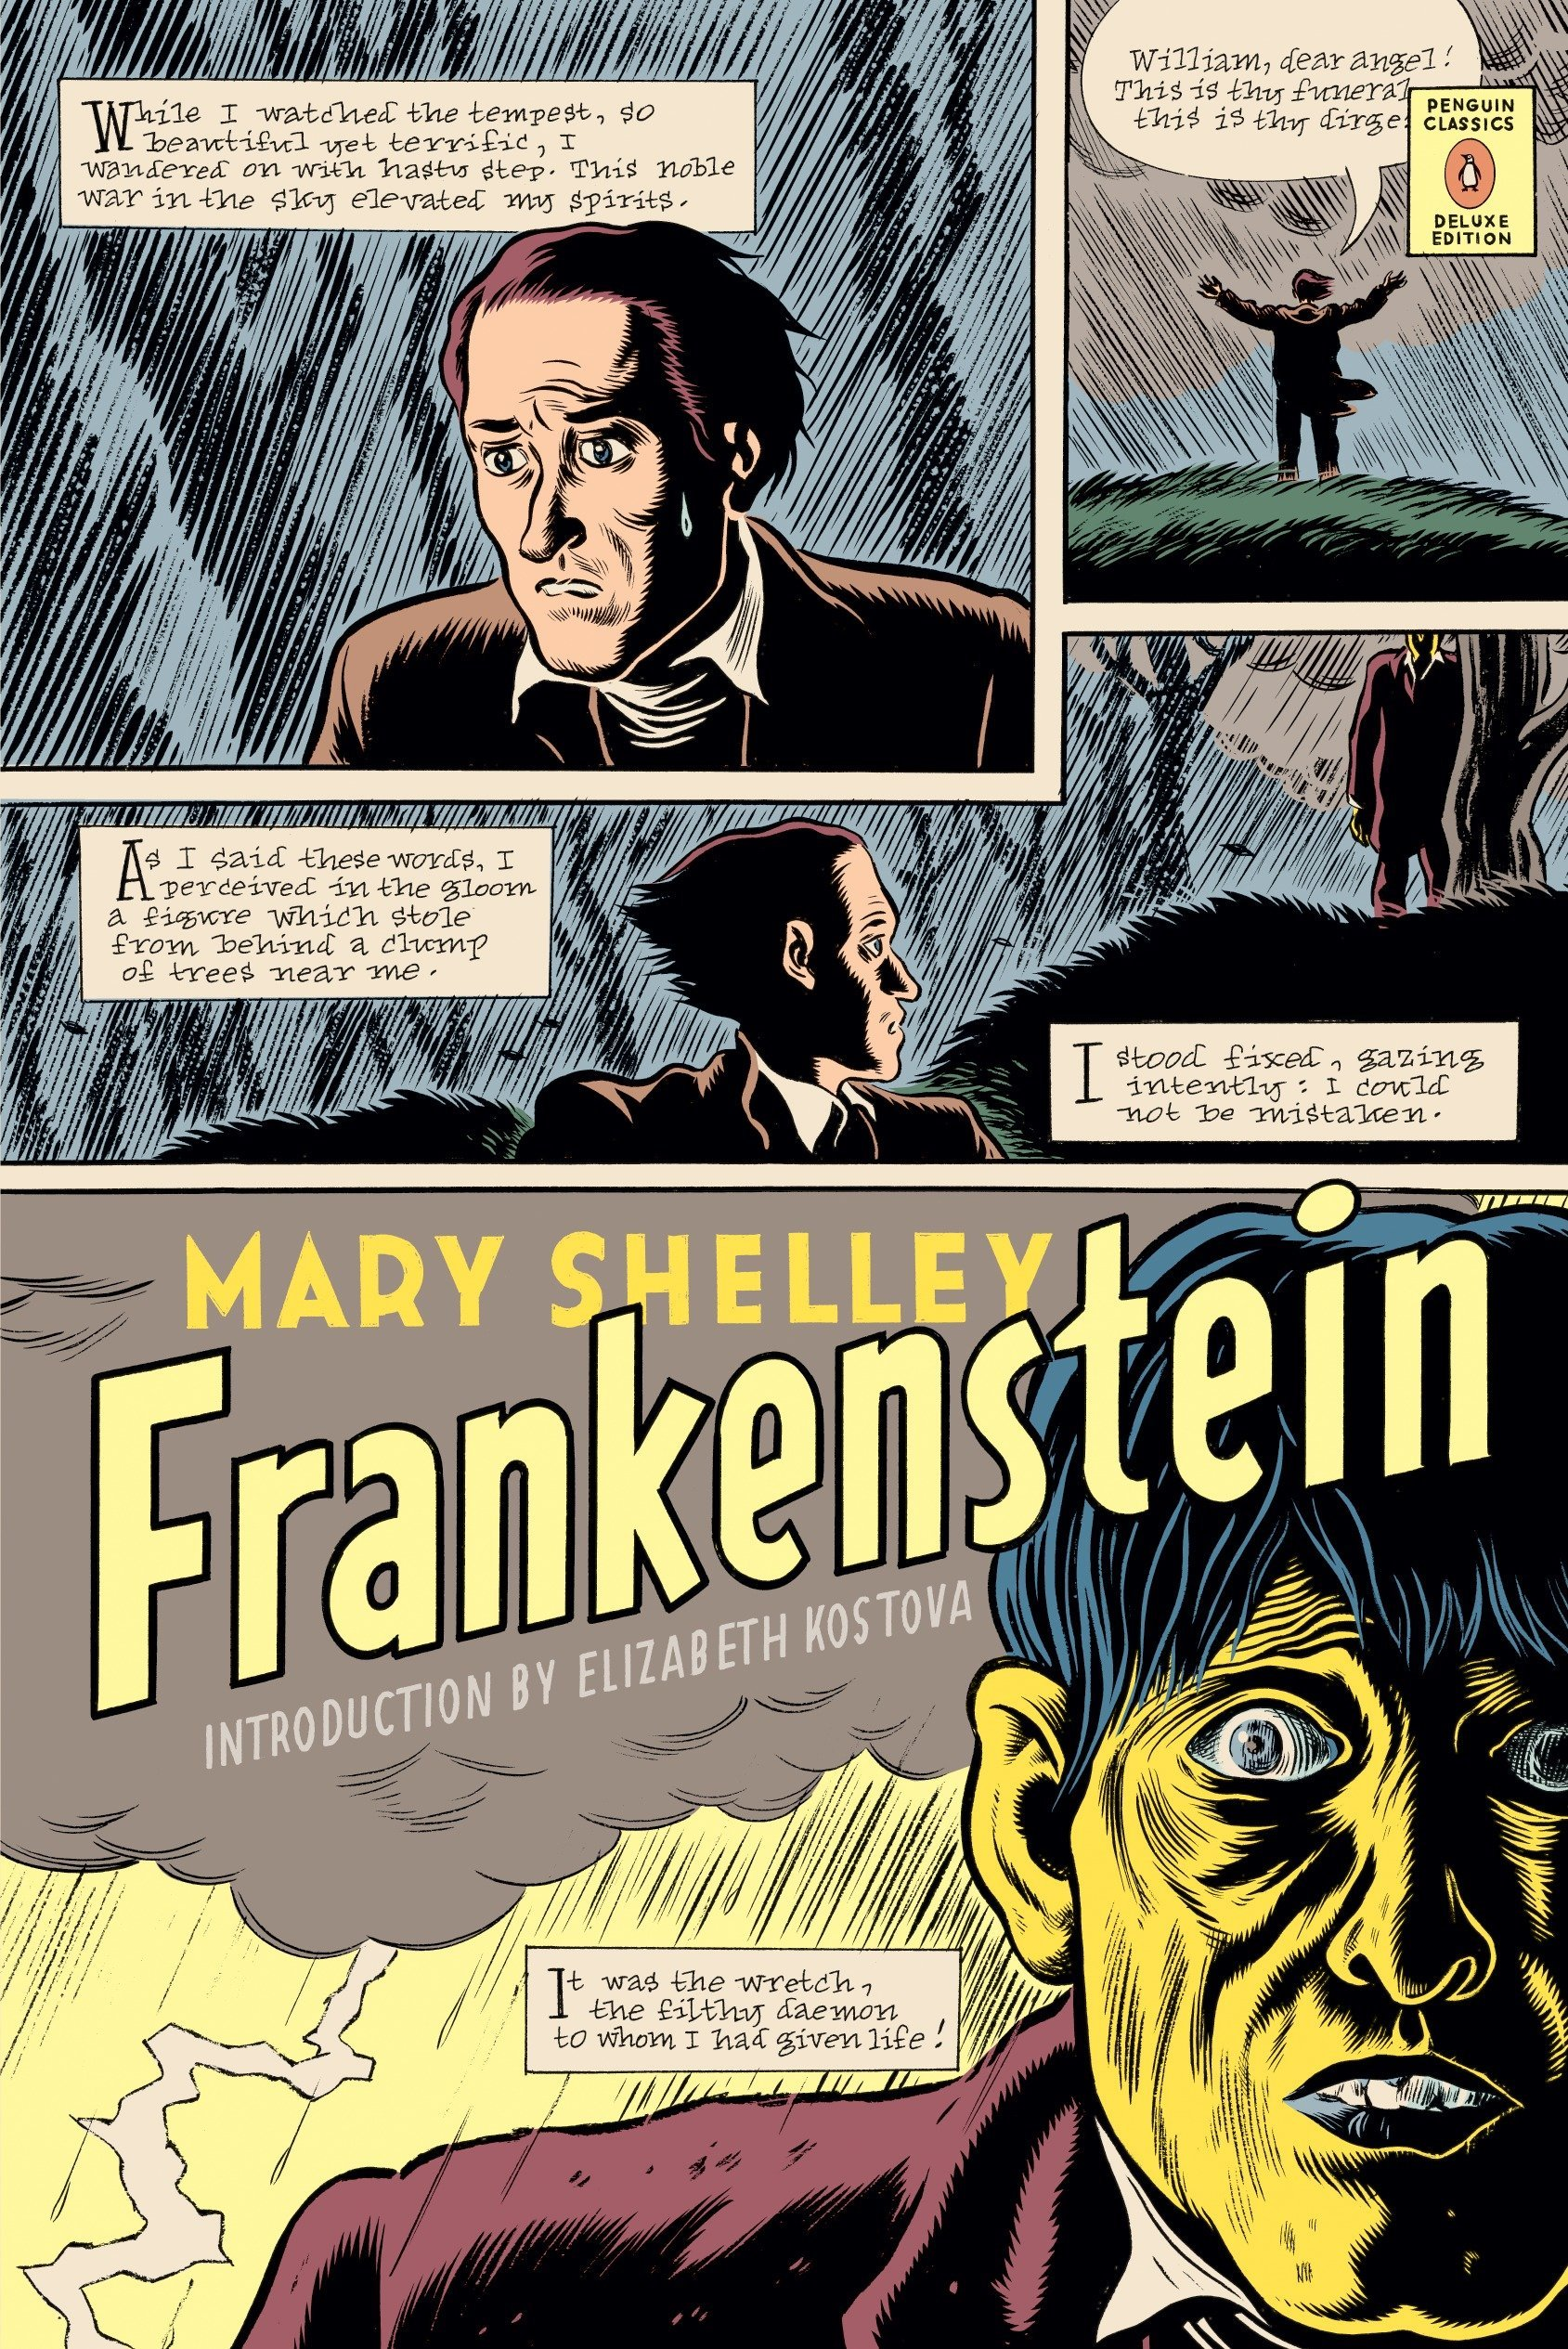 Frankenstein: (Penguin Classics Deluxe Edition): Mary Shelley, Maurice  Hindle, Daniel Clowes, Elizabeth Kostova: 9780143105039: Amazon.com: Books